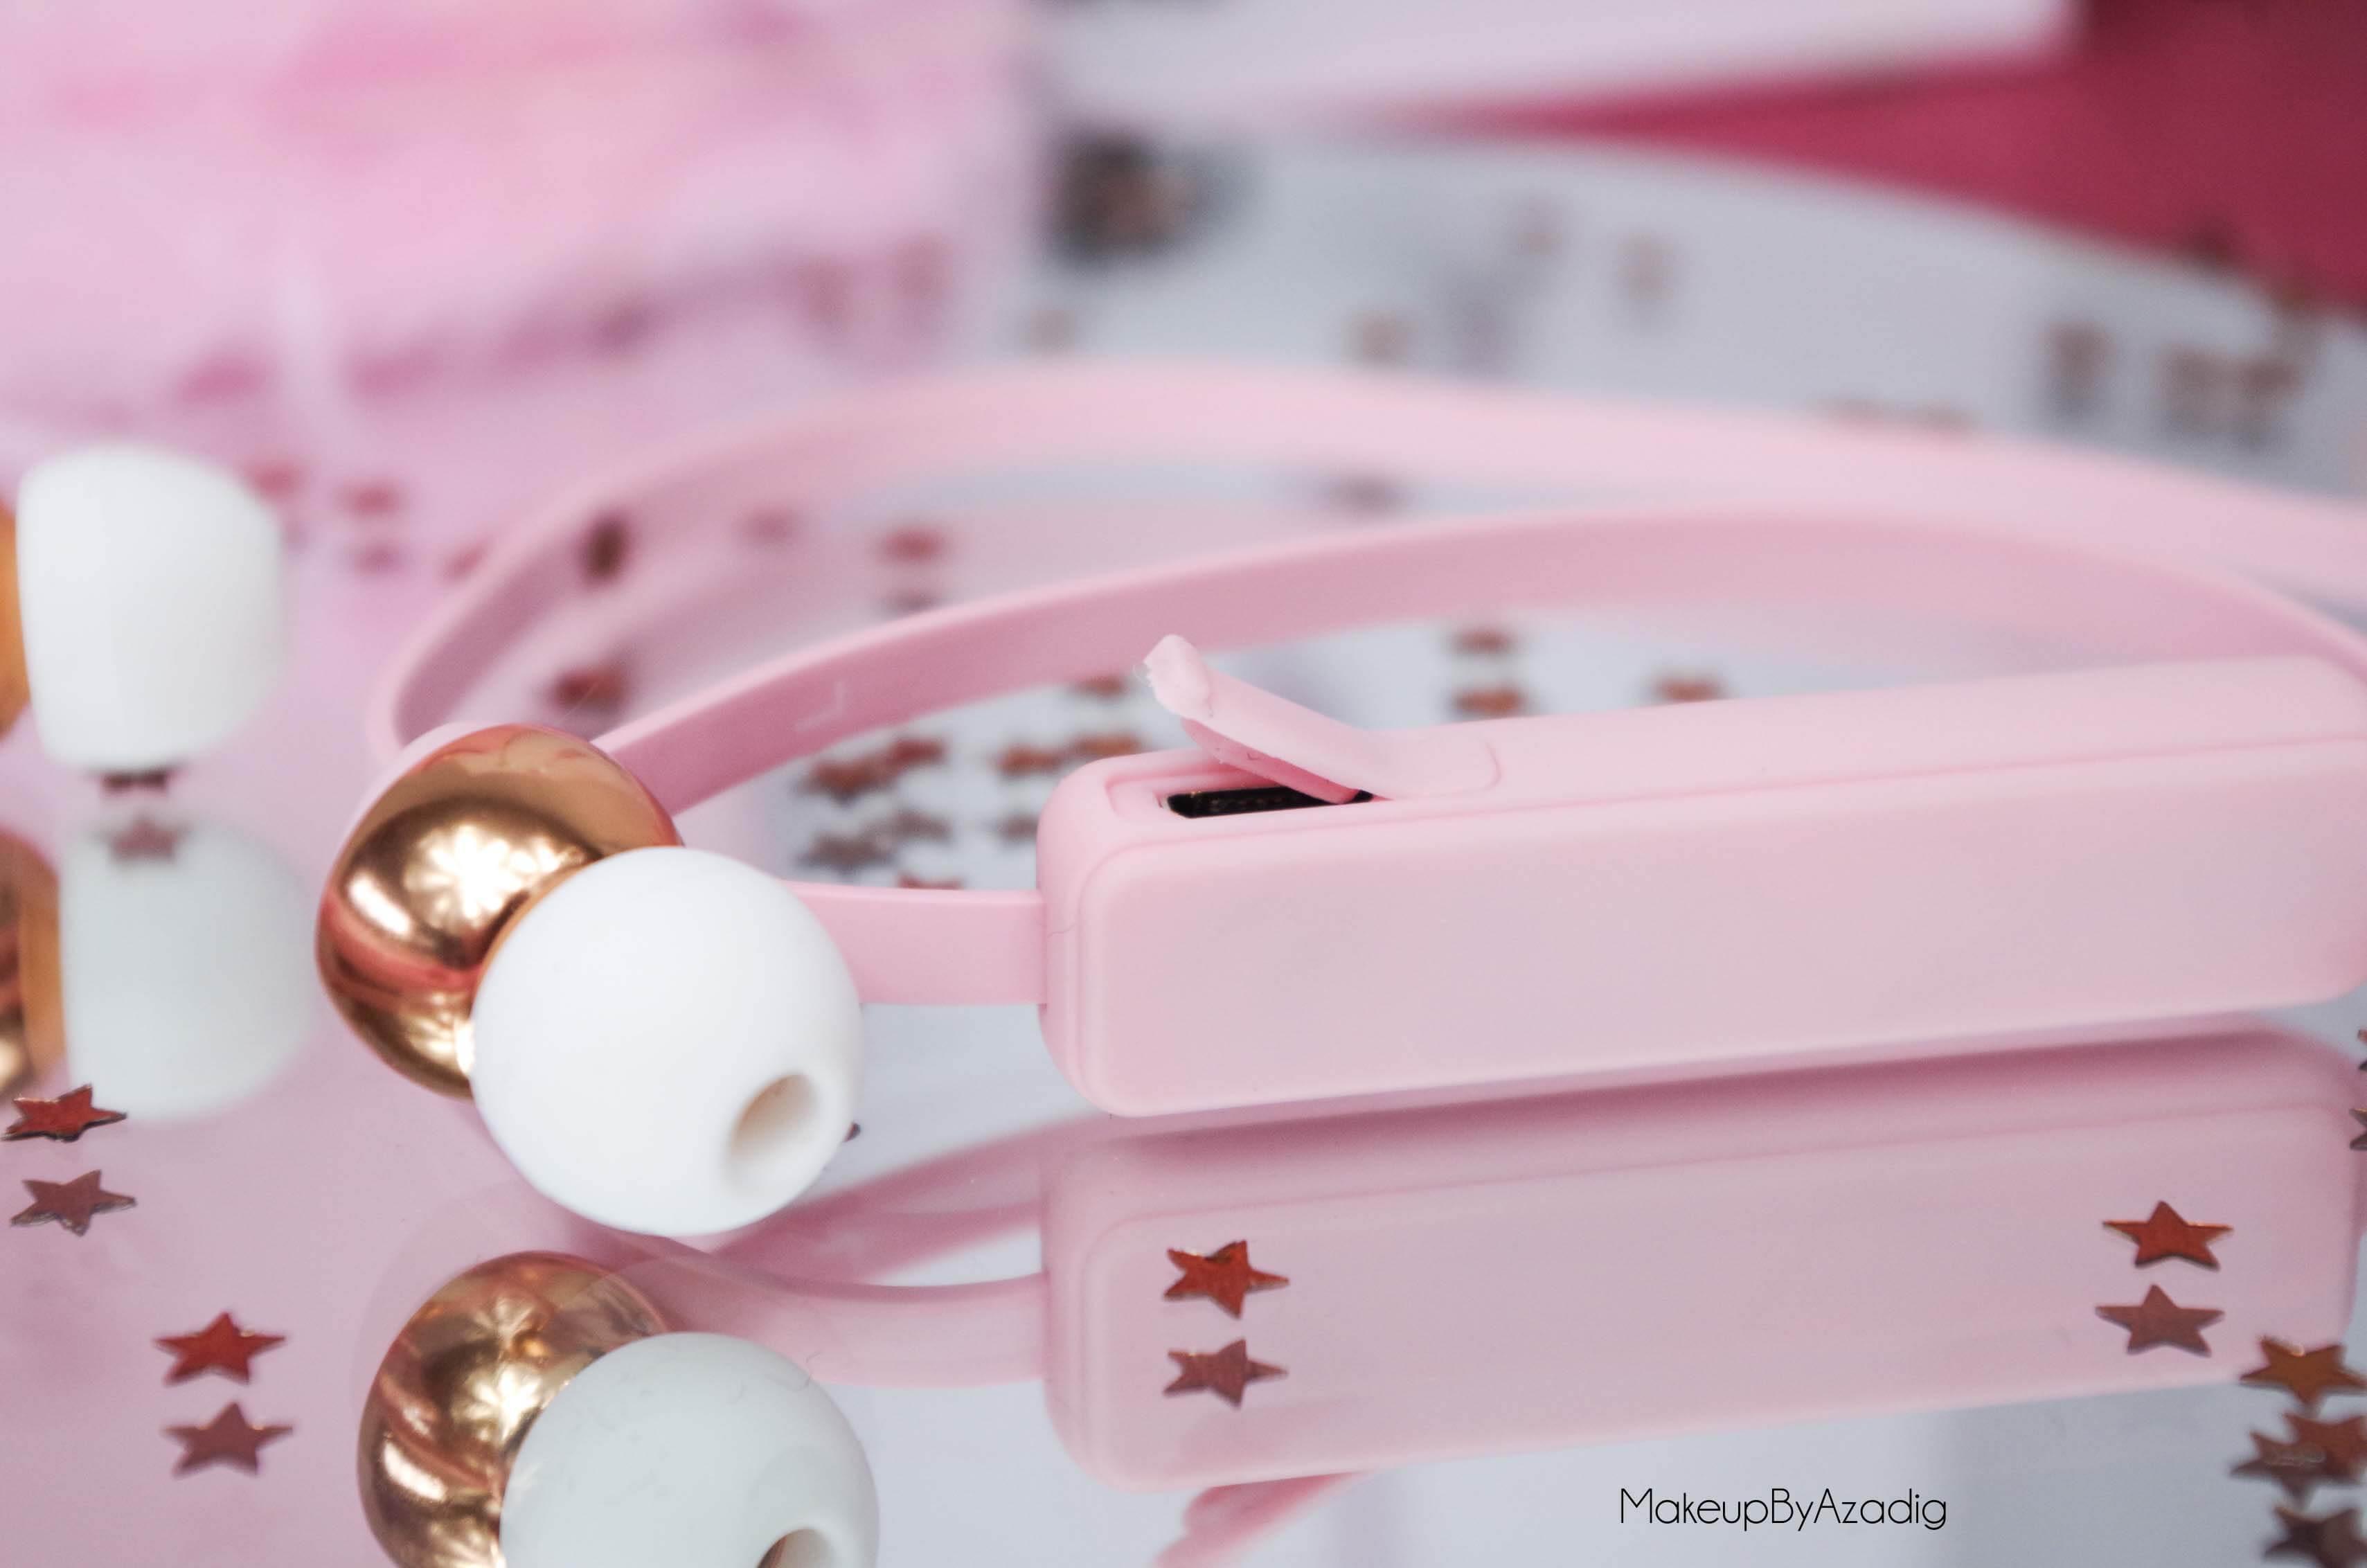 ecouteurs-casque-sans-fil-bluetooth-design-tendance-sudio-sweden-rose-vasa-bla-makeupbyazadig-avis-prix-cable